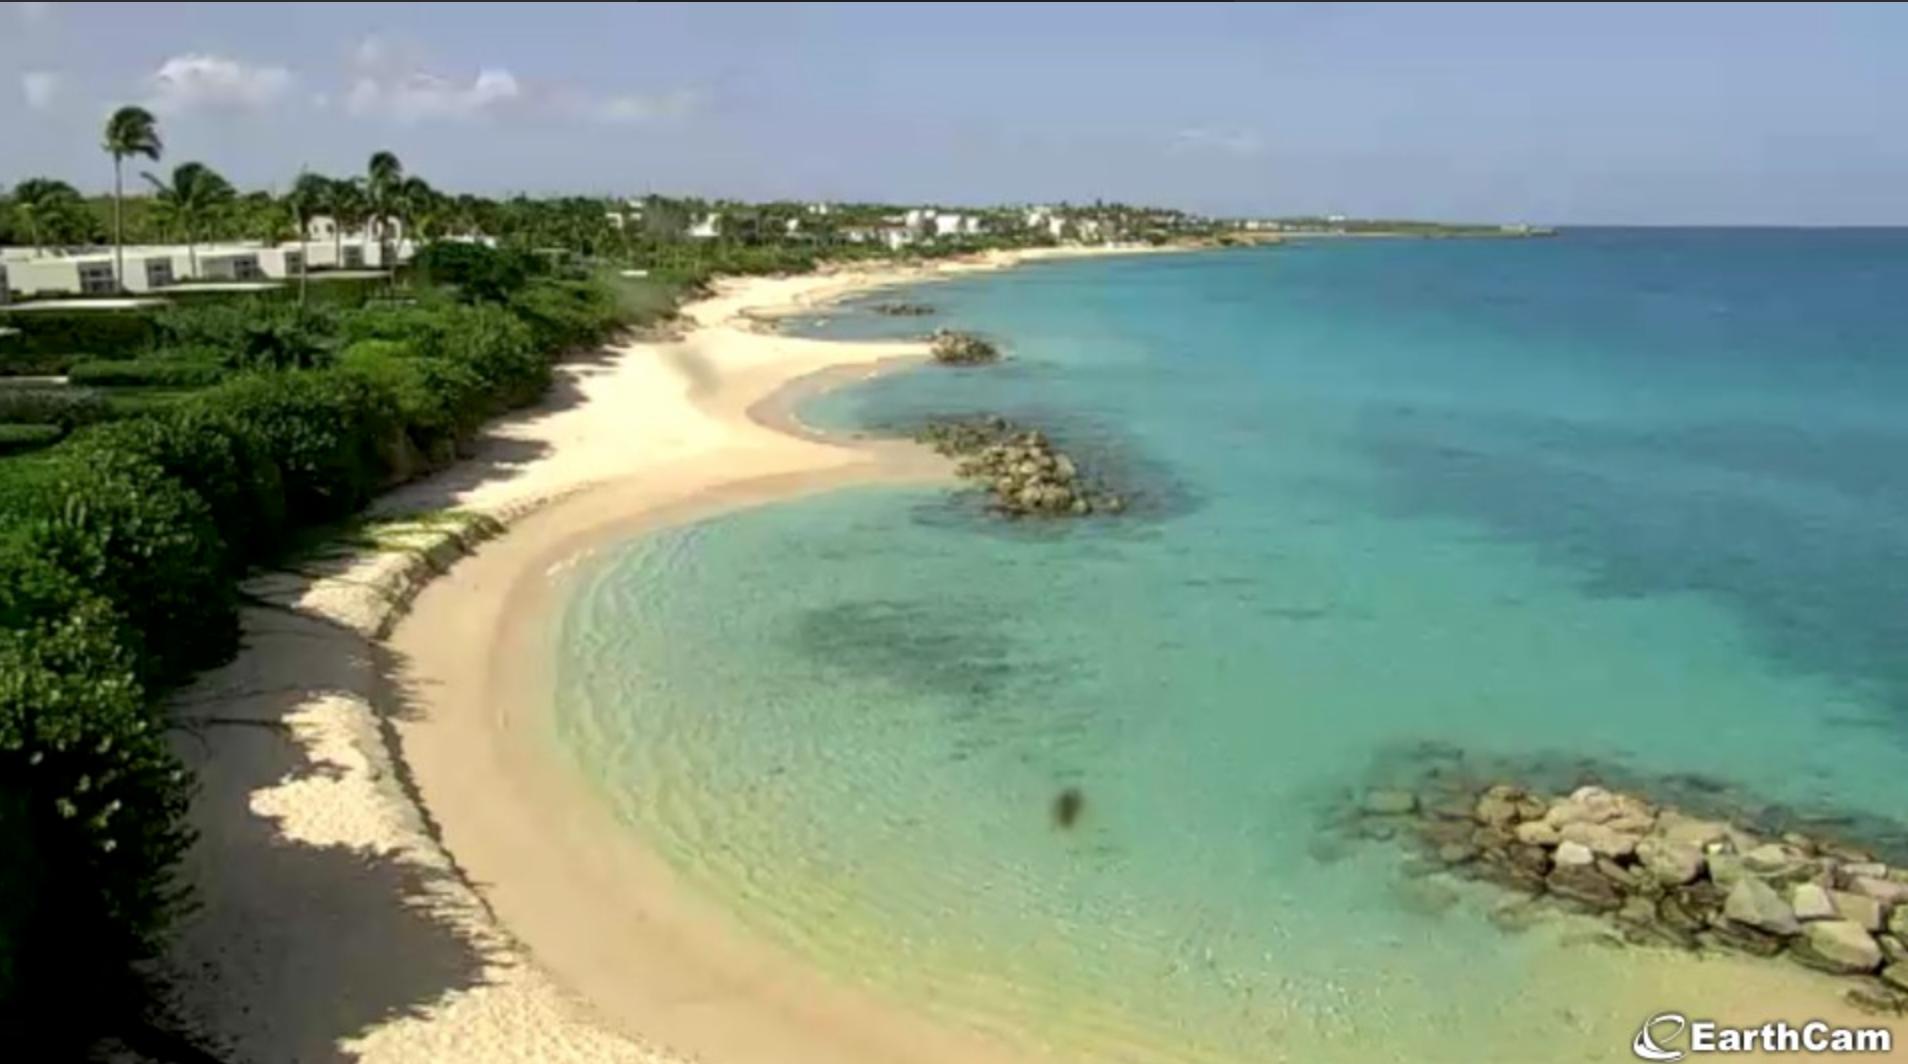 Barnes bay, Anguilla